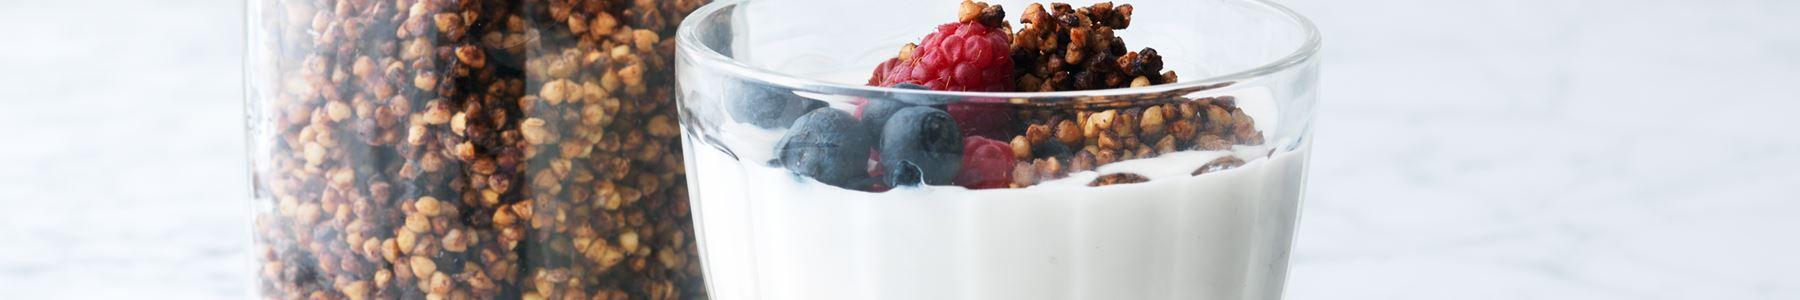 Hallon + Frukost + Glass